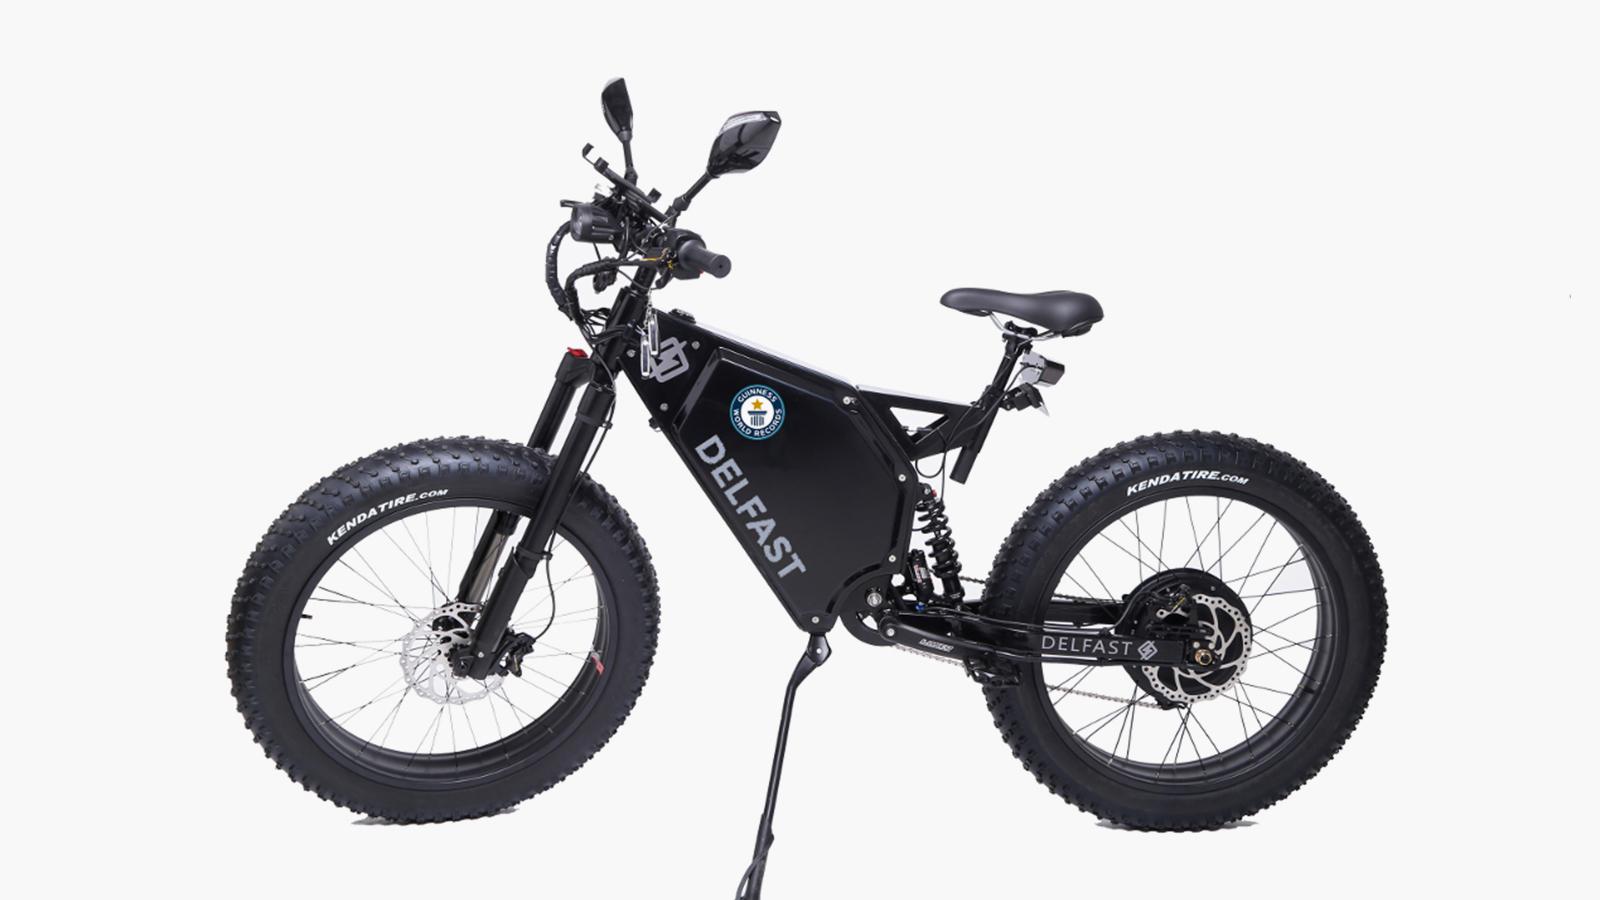 Delfast Offroad Electric Bike